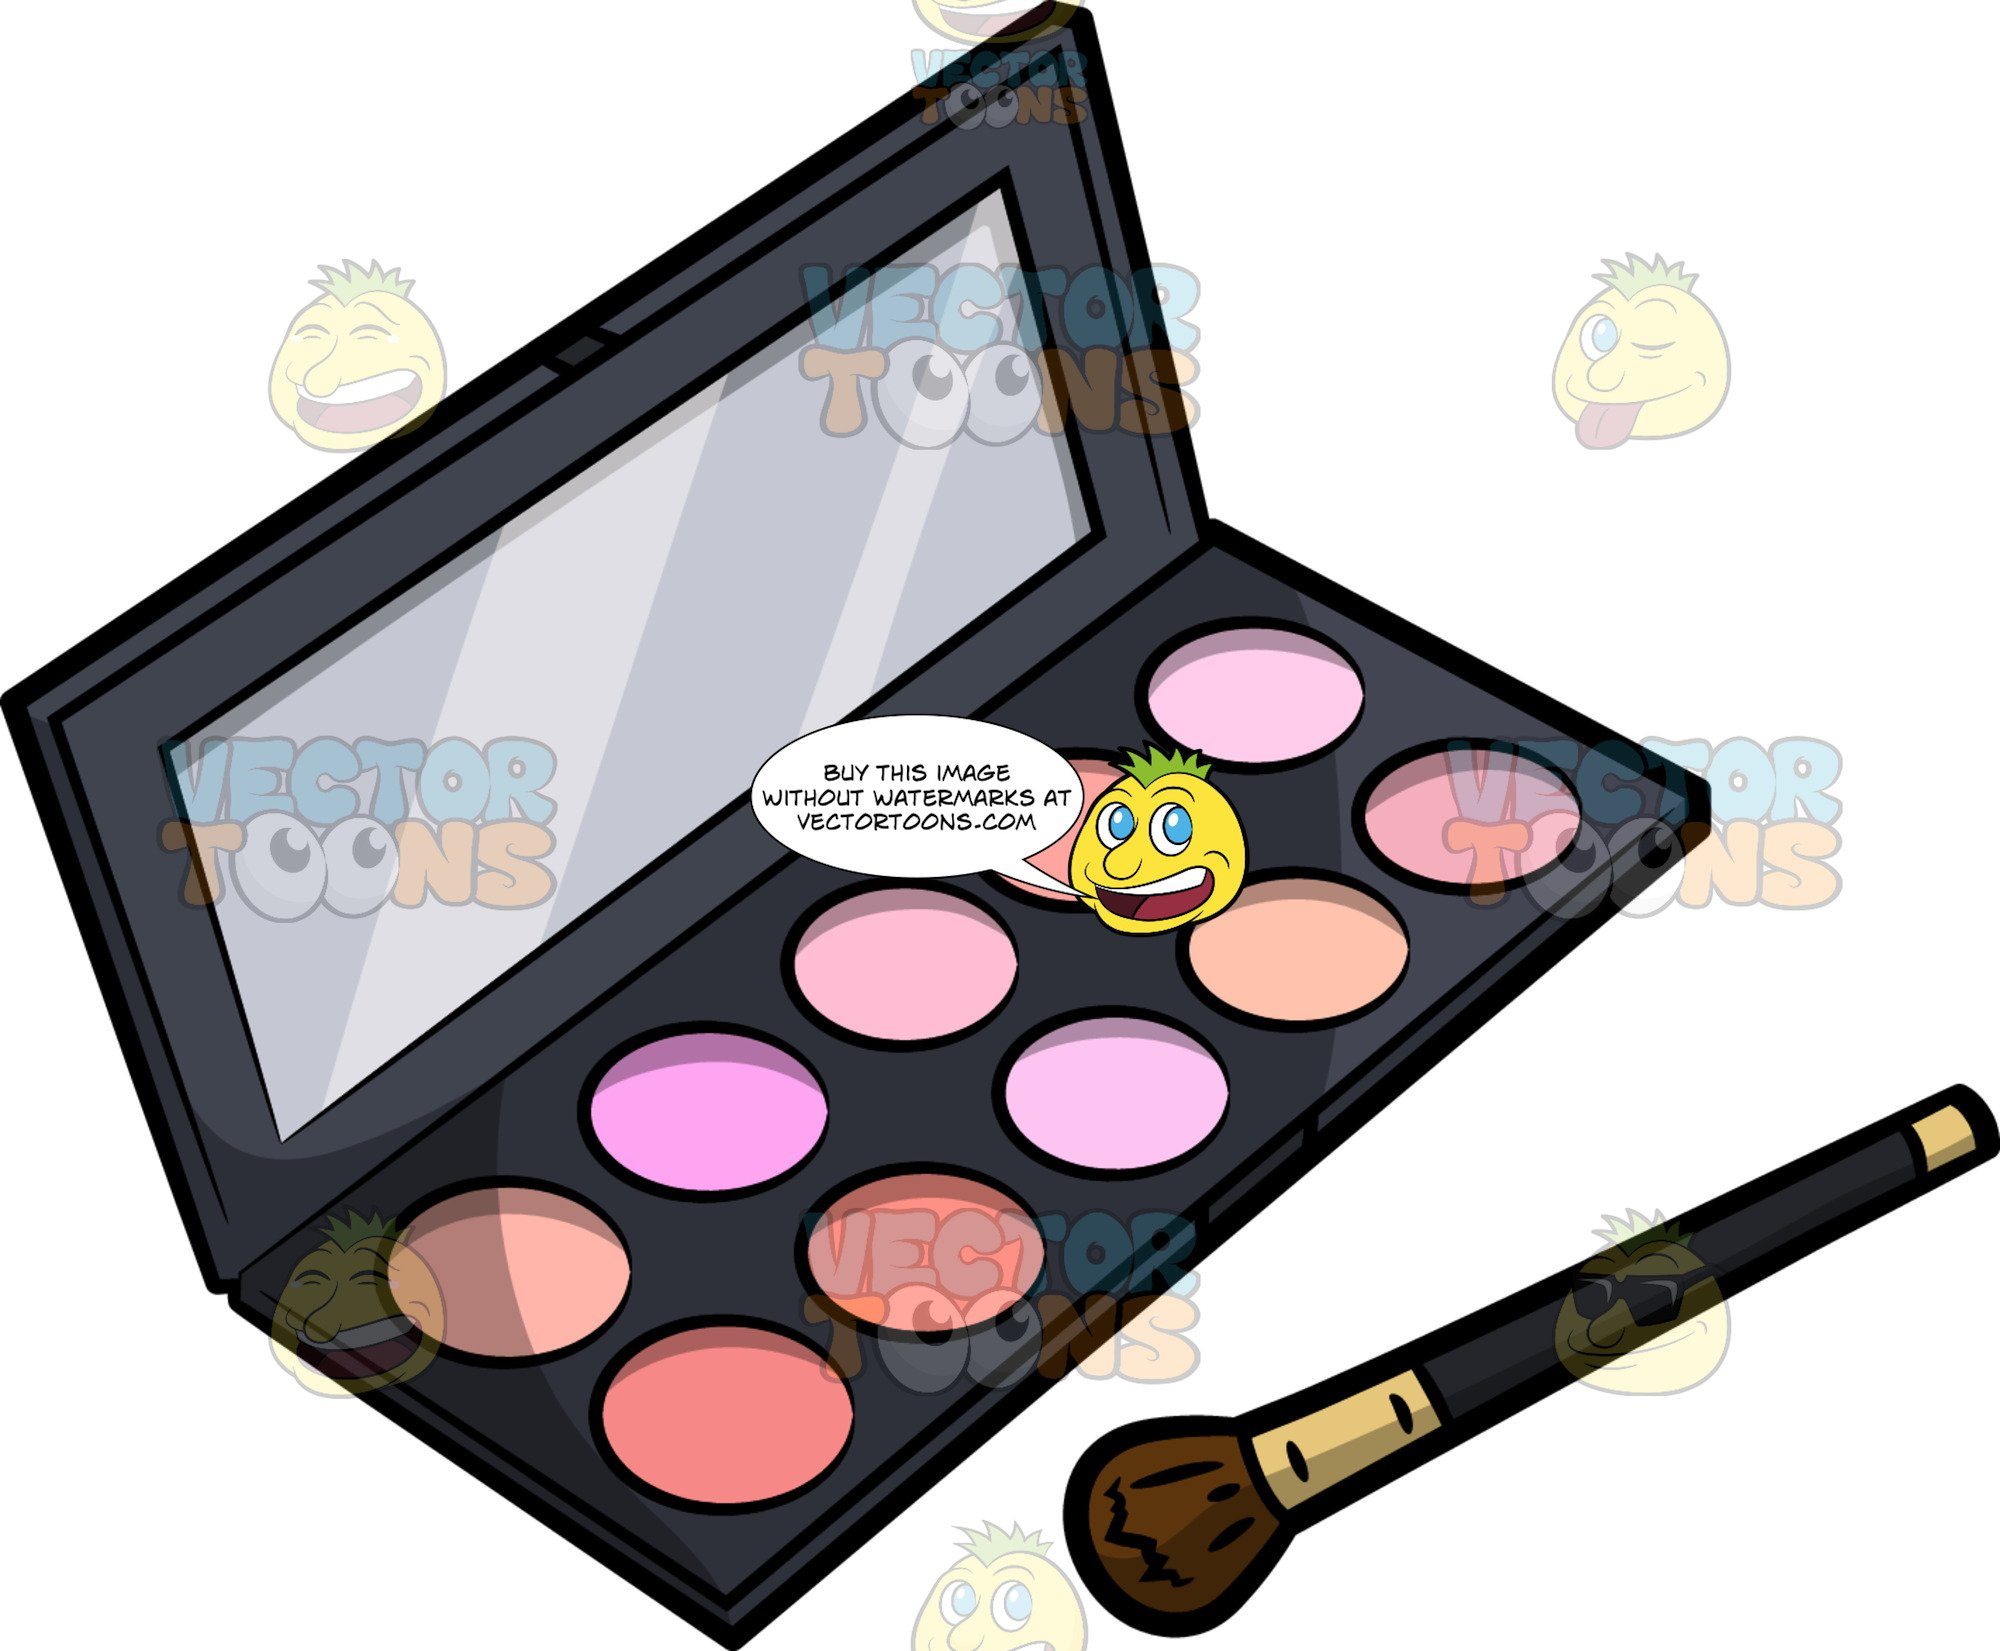 A Palette Case Of Different Blush Colors.